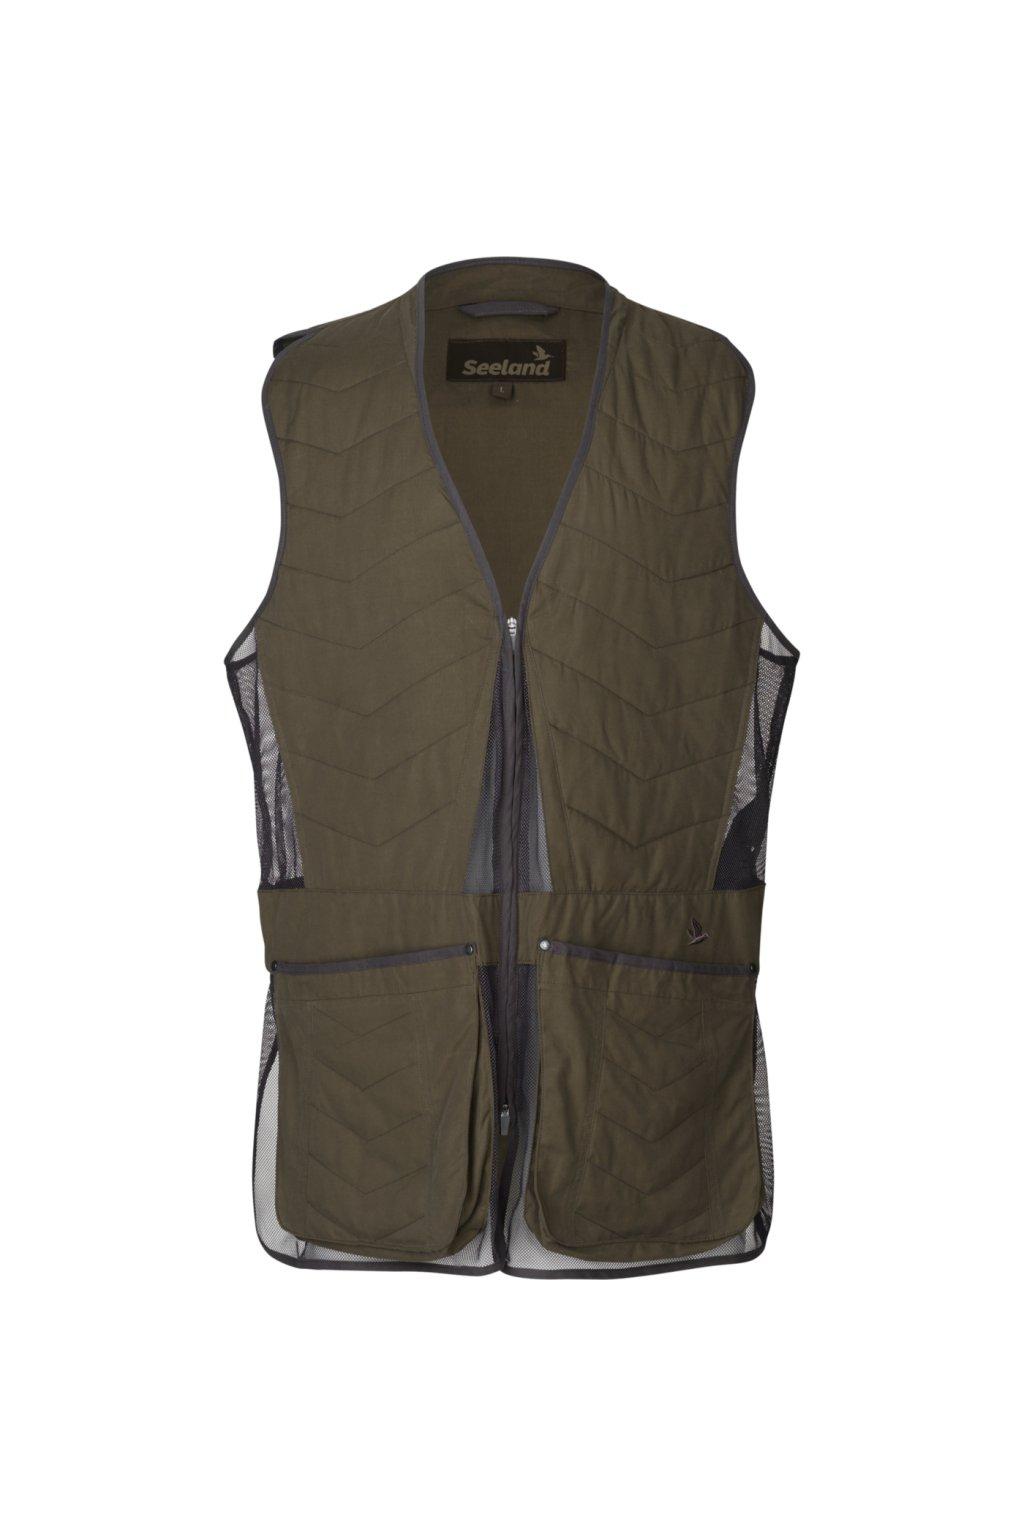 Seeland - Skeet light vesta střelecká Pine green